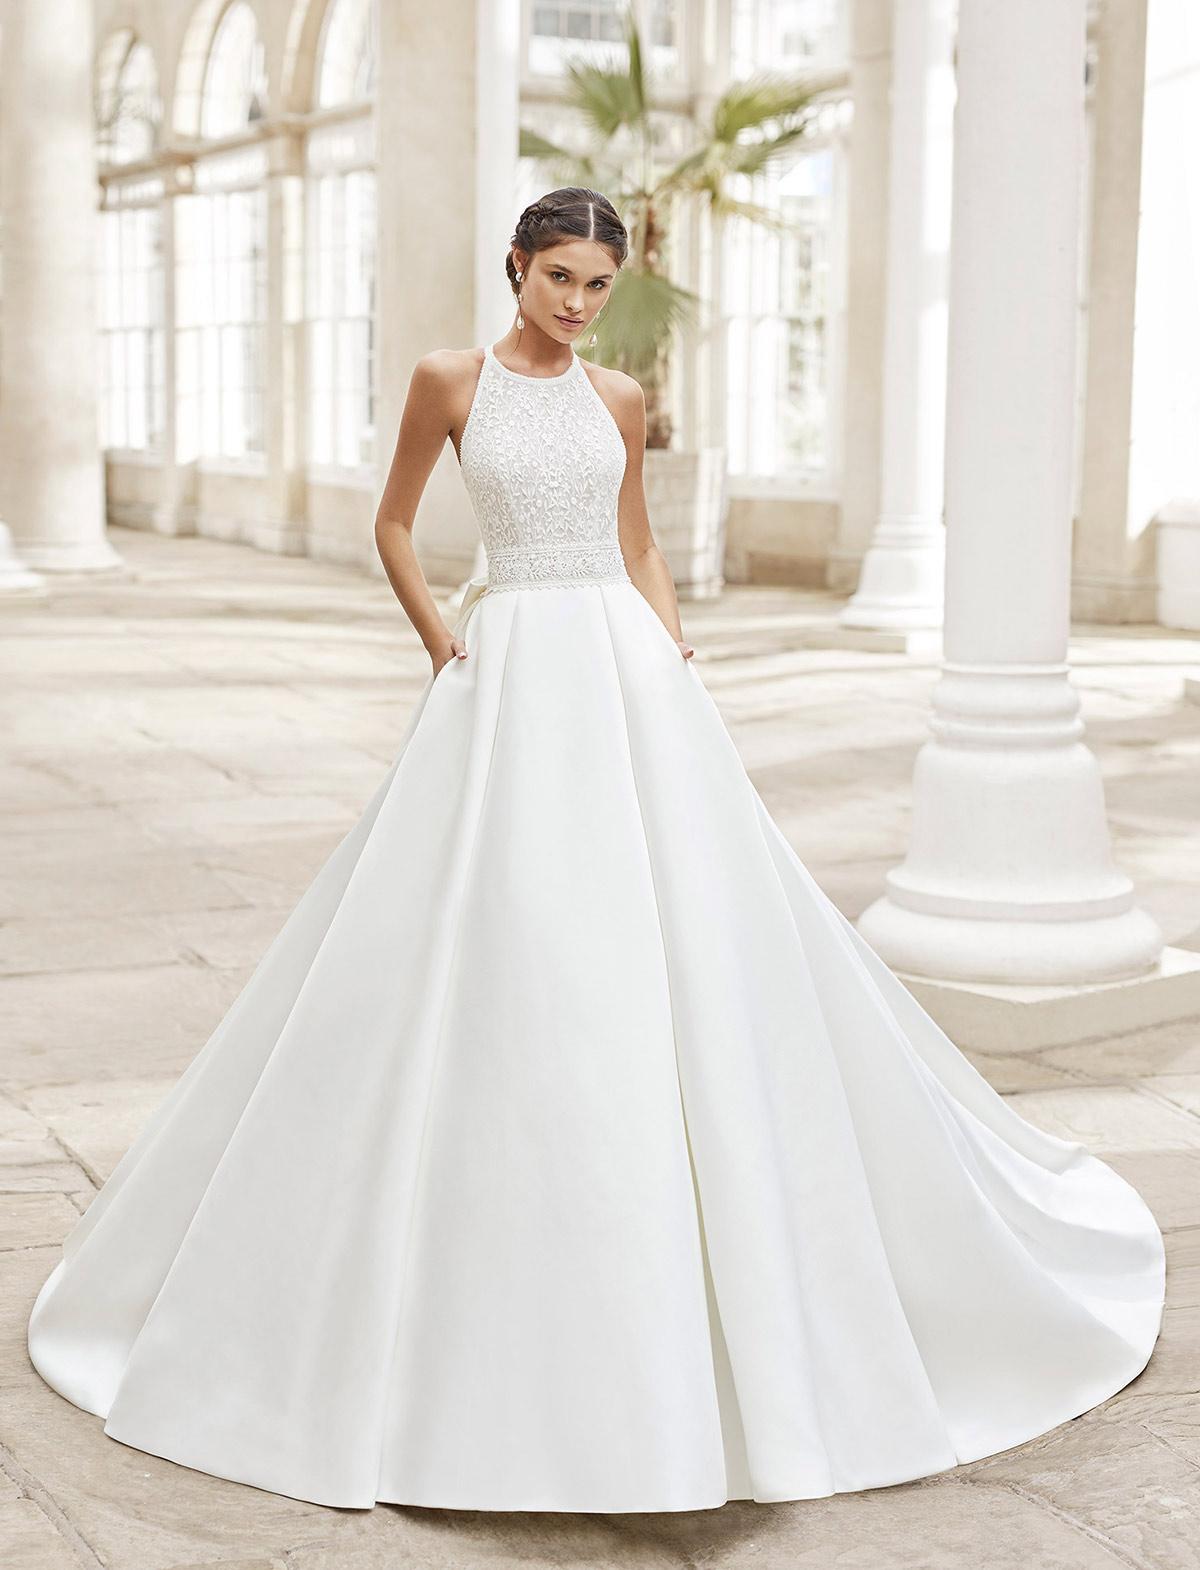 Rosa Clarà Tysar Abito Sposa 2021